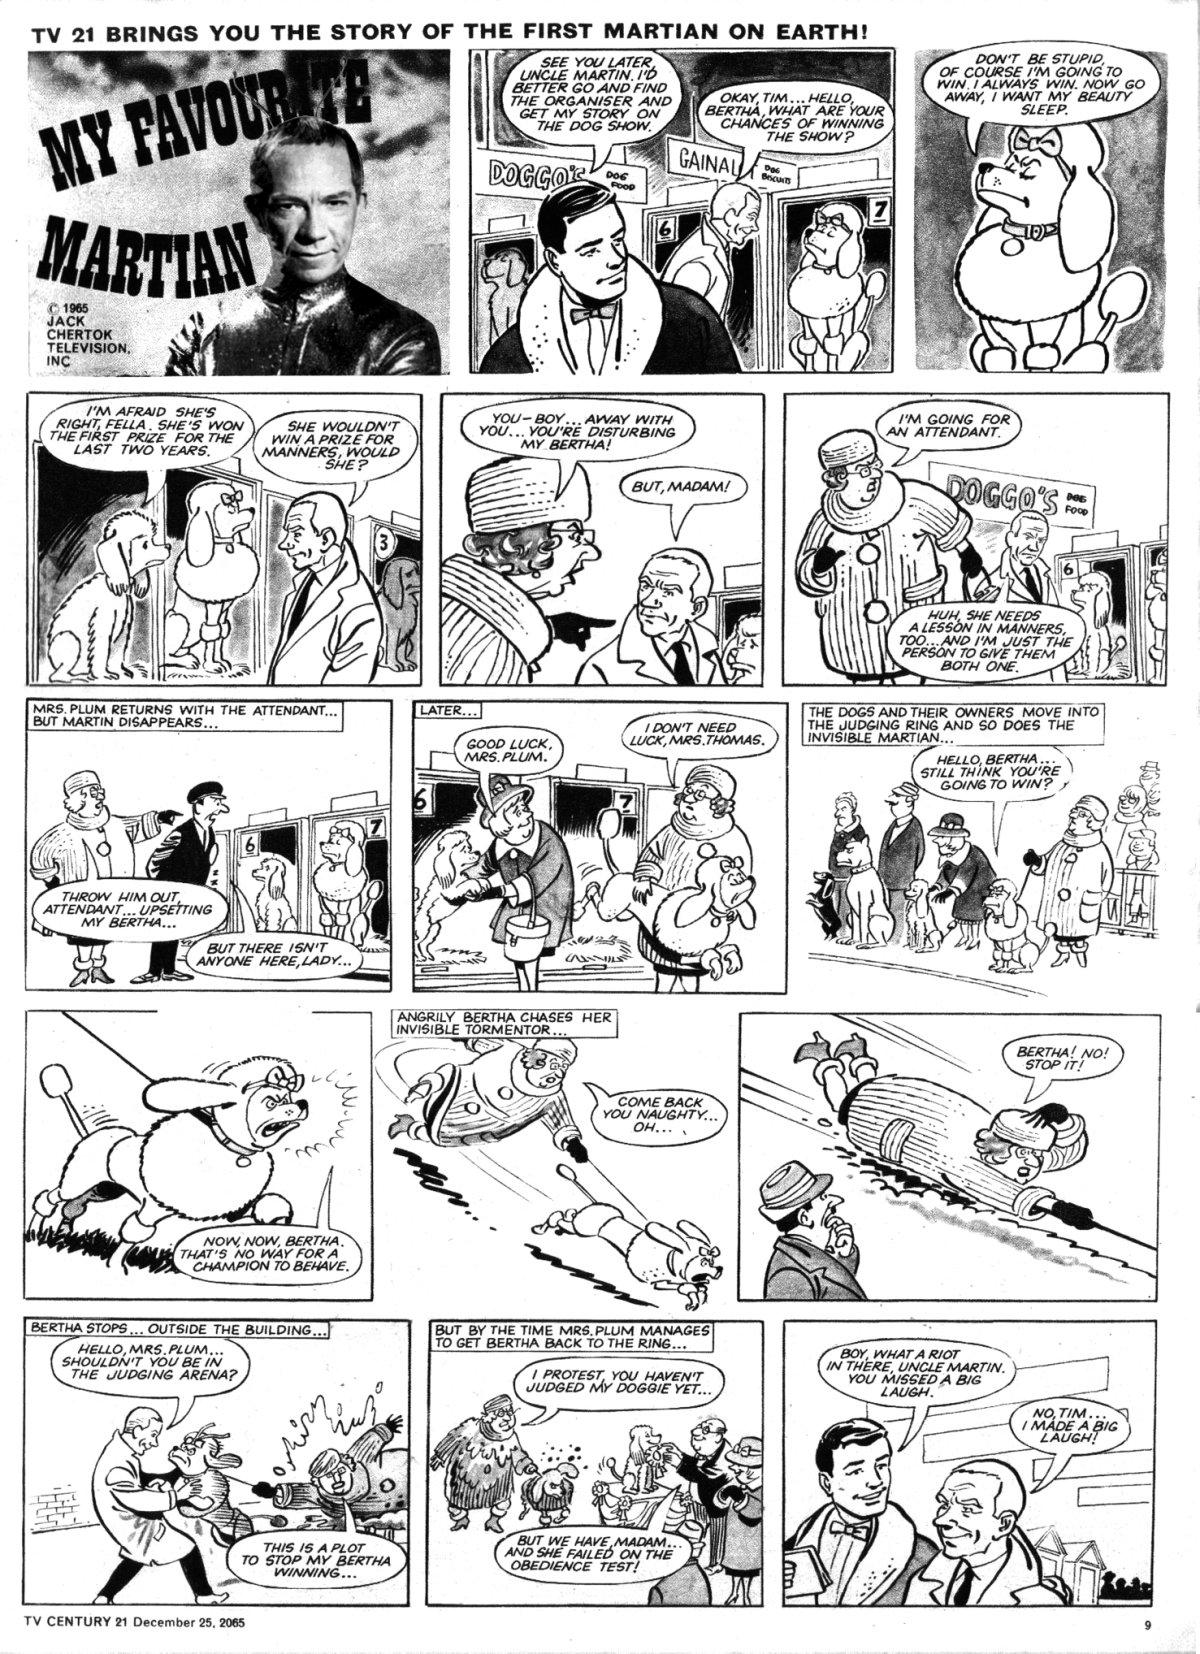 Read online TV Century 21 (TV 21) comic -  Issue #49 - 9